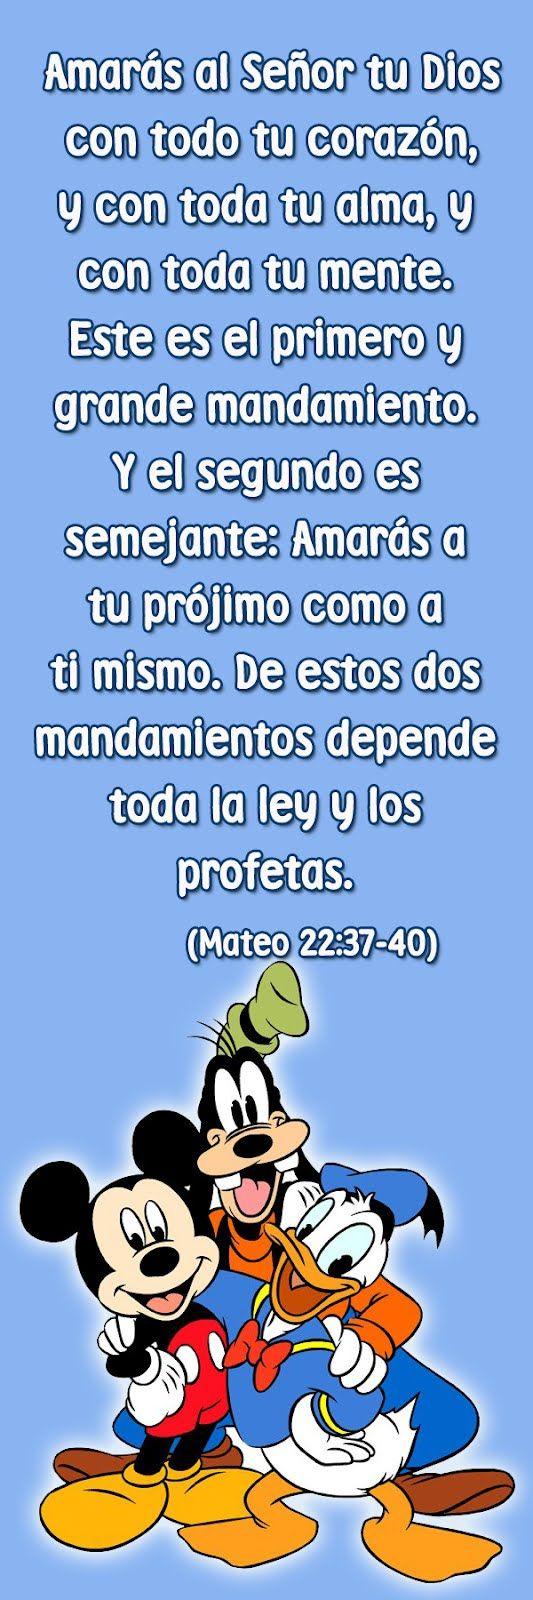 "MARCOS GRATIS PARA FOTOS: SEPARADORES 2"" X 6"", JPG, PENSAMIENTOS CRISTIANOS…"